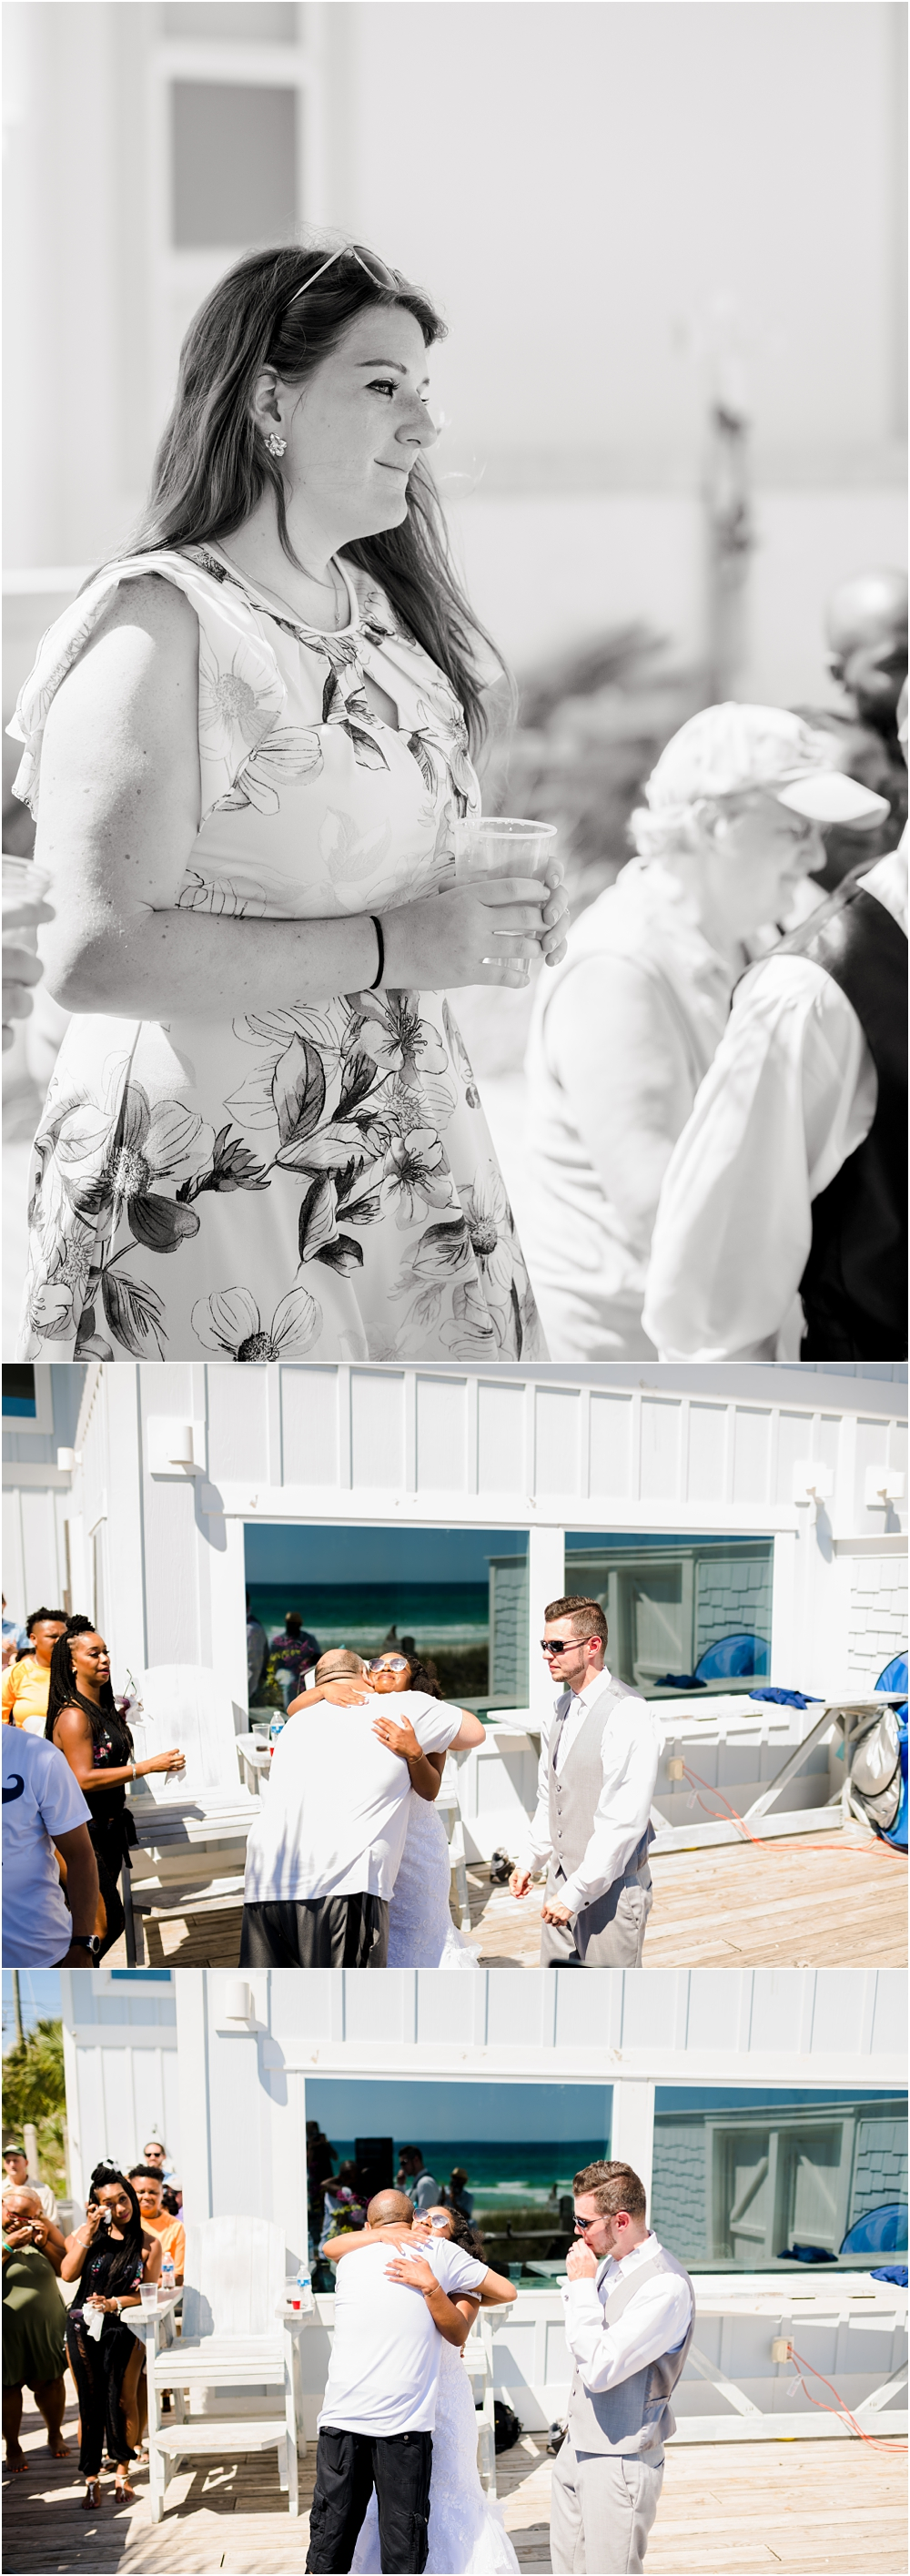 kelsey-panama-city-beach-florida-wedding-kiersten-stevenson-photography (555 of 580).jpg